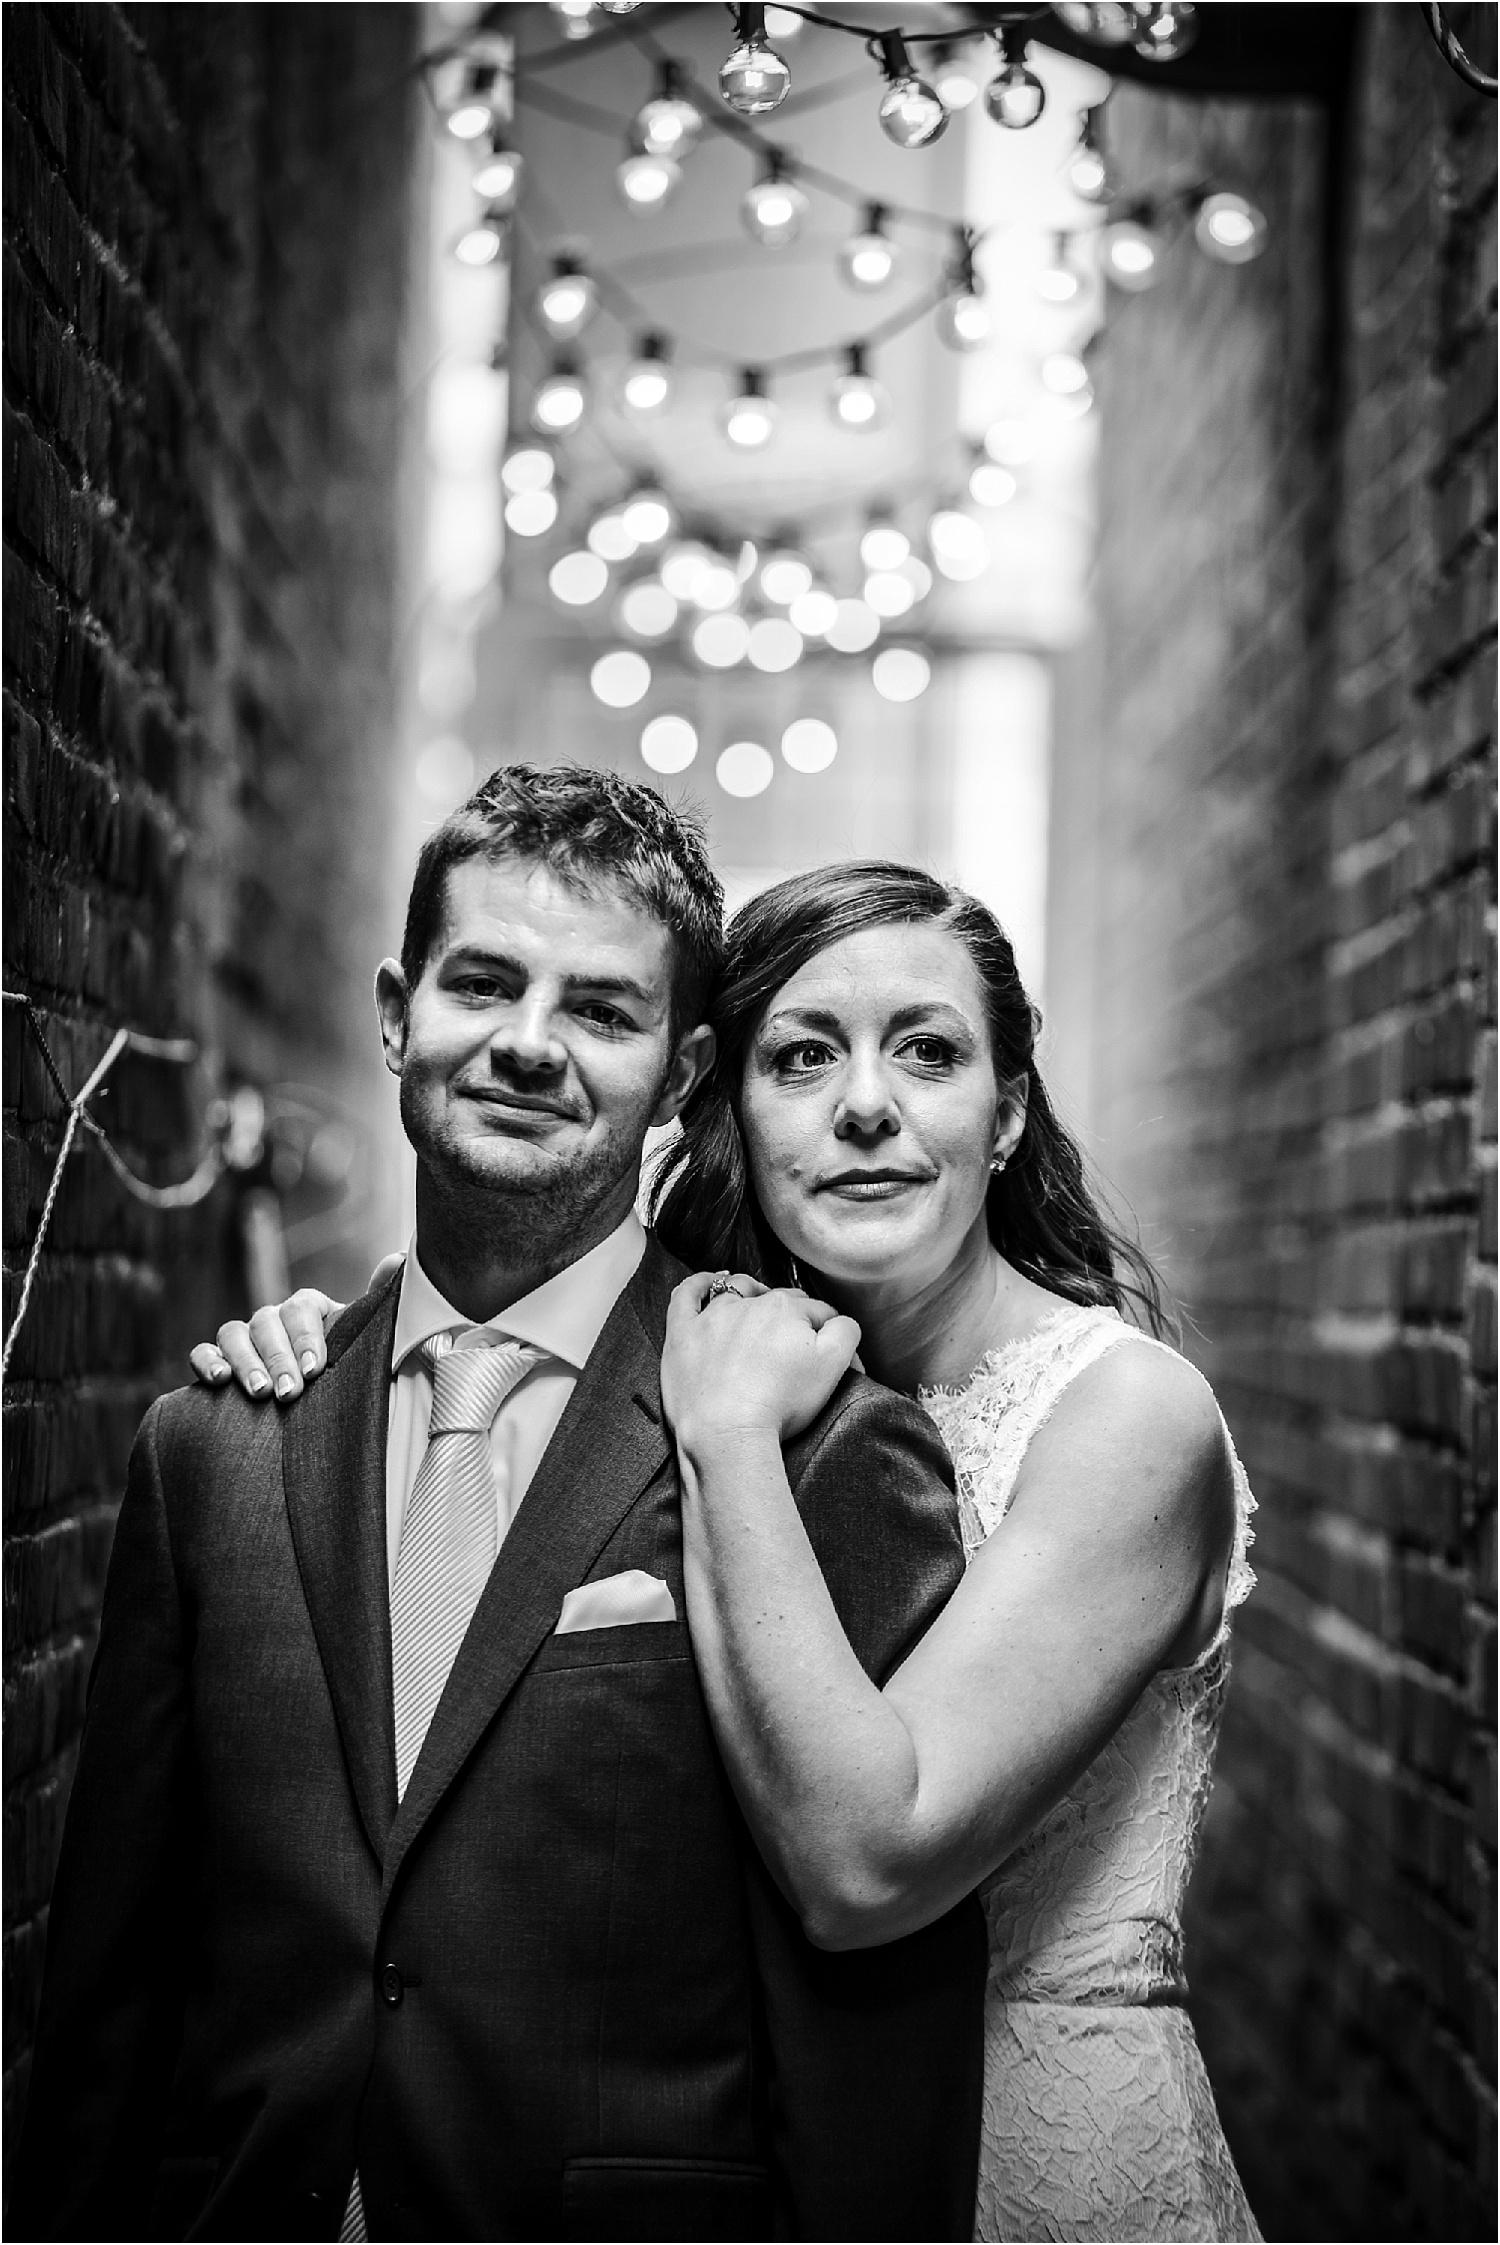 Denver_Wedding_Photography_Skylight_Urban_Venue_Modern_Bride_015.jpg